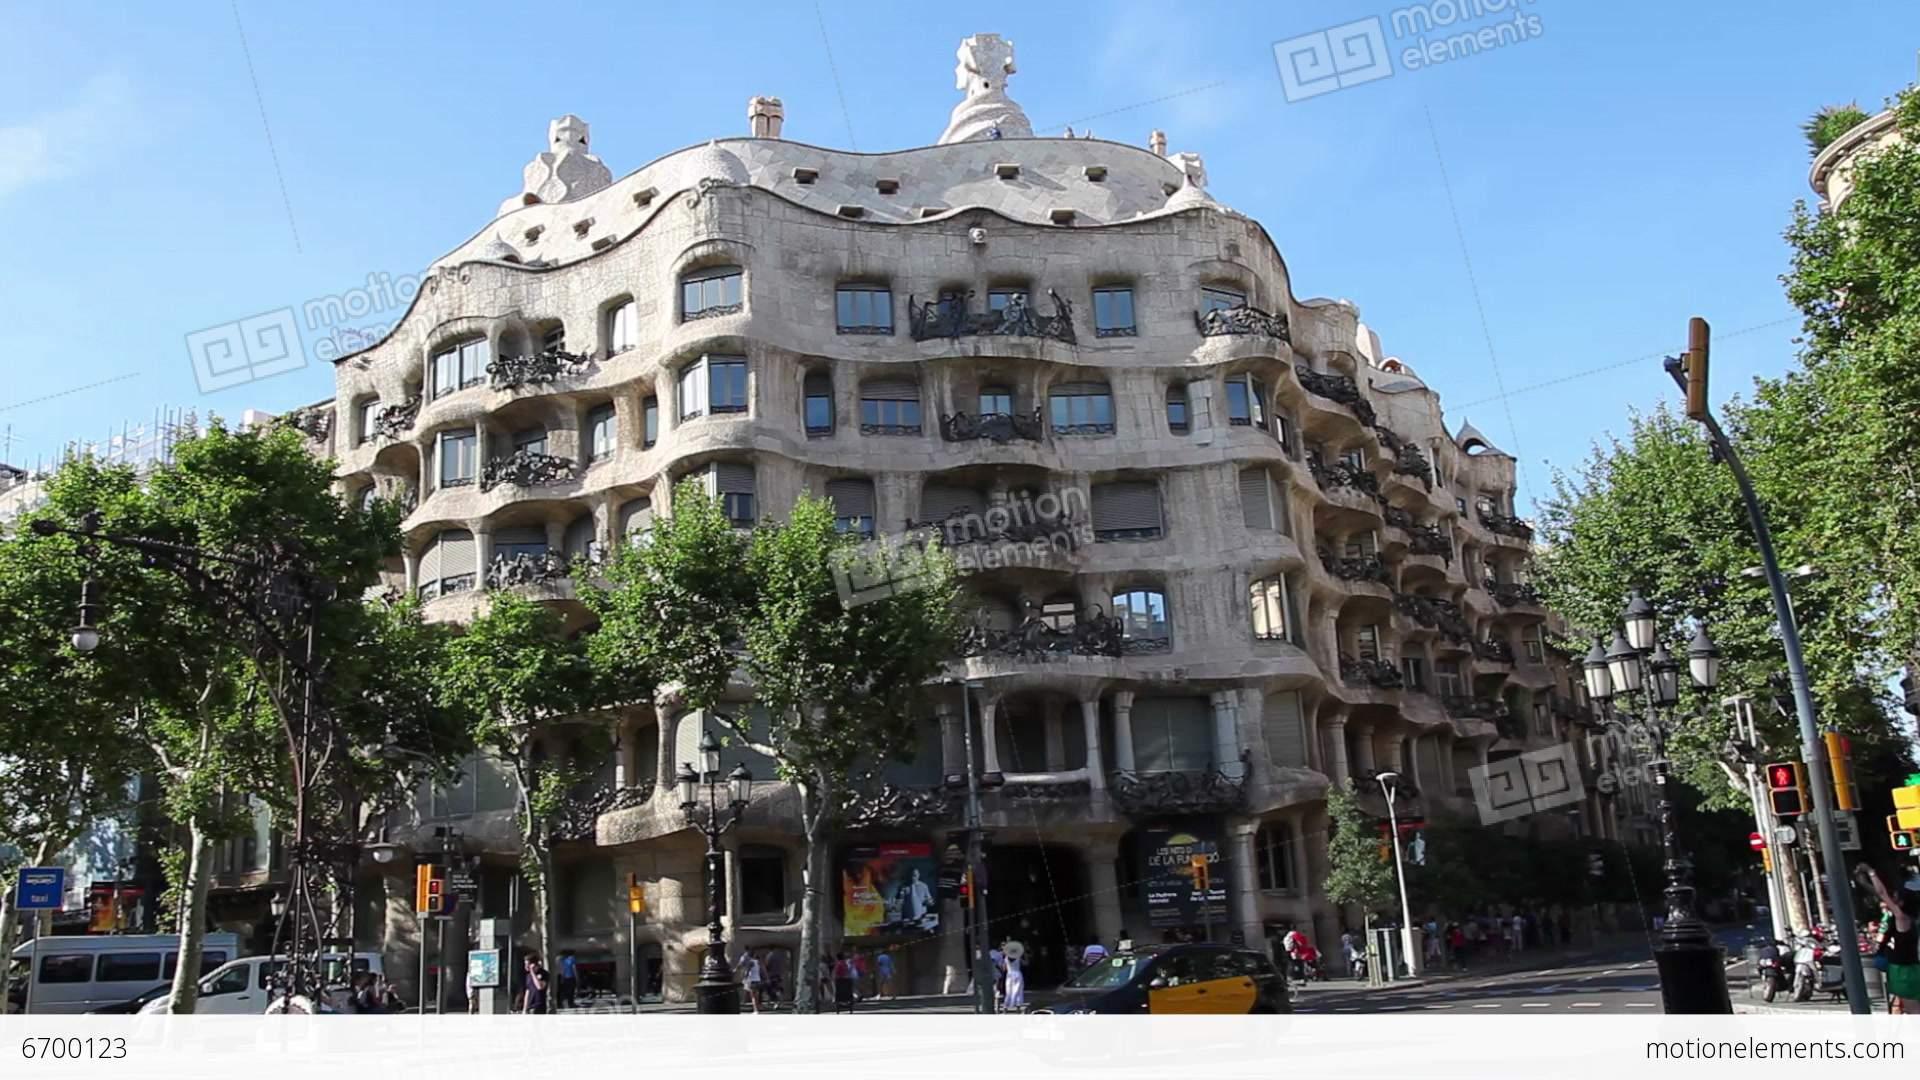 La pedrera casa mila gaudi building in barcelona stock video footage 6700123 - Casa mila la pedrera ...